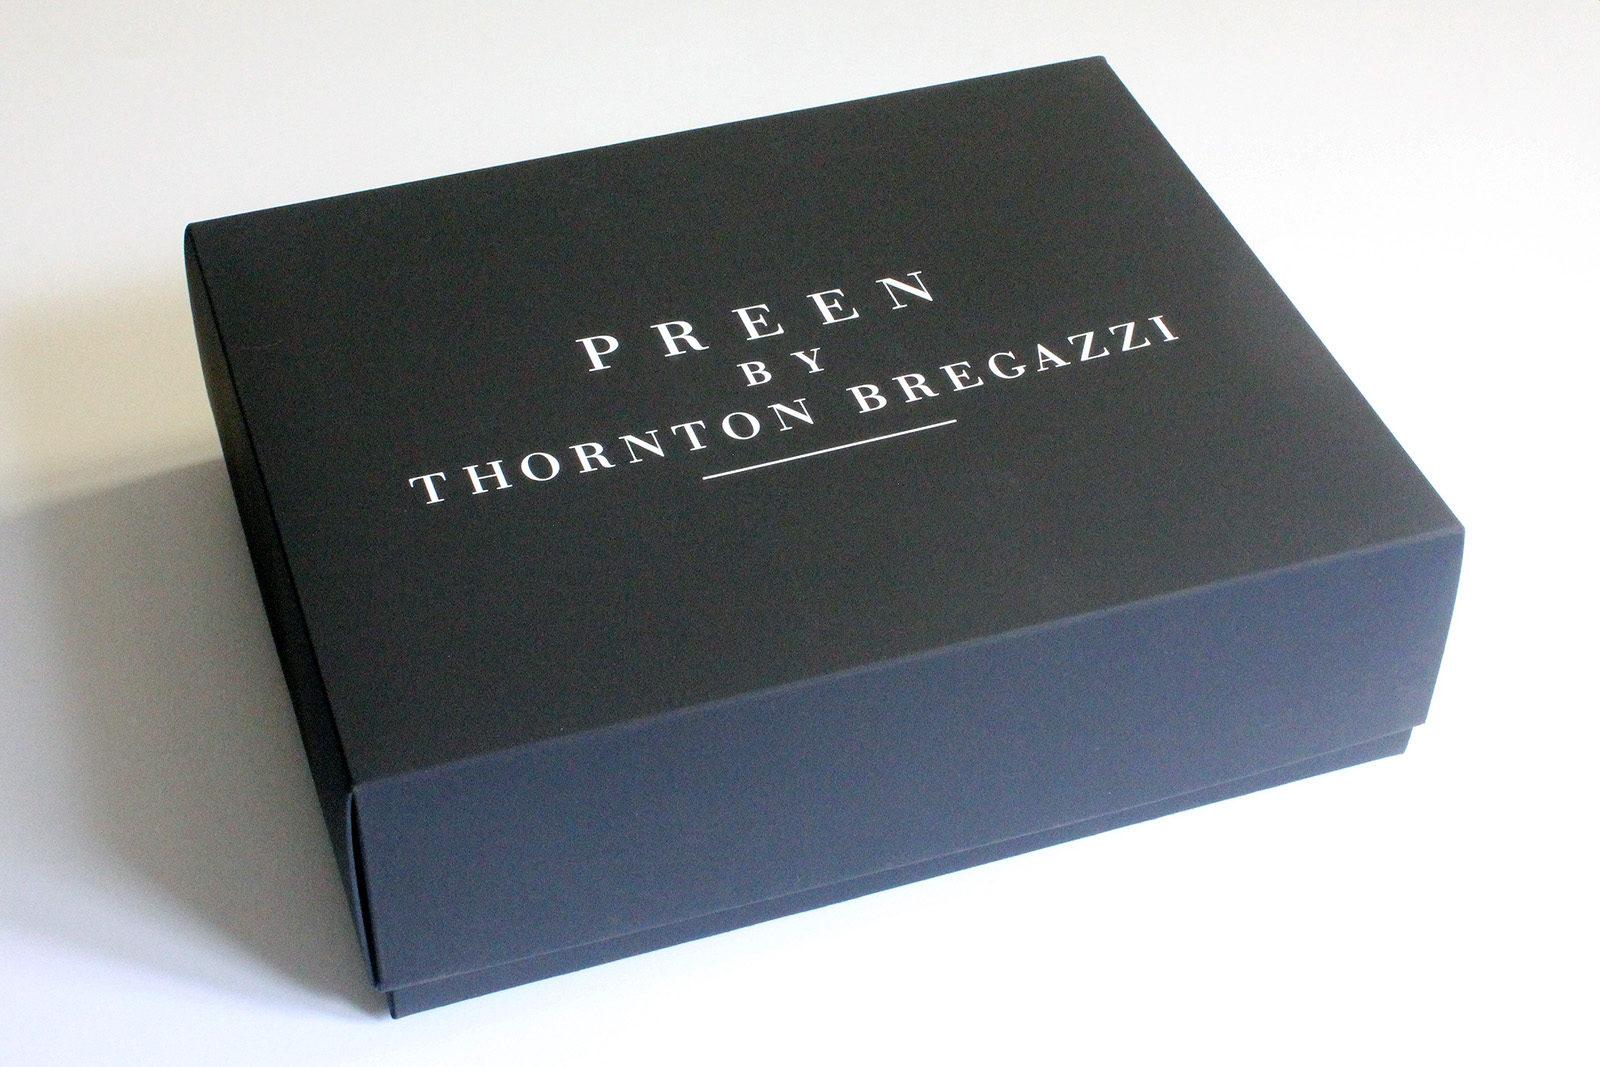 Preen by Thornton Bregazzi - box